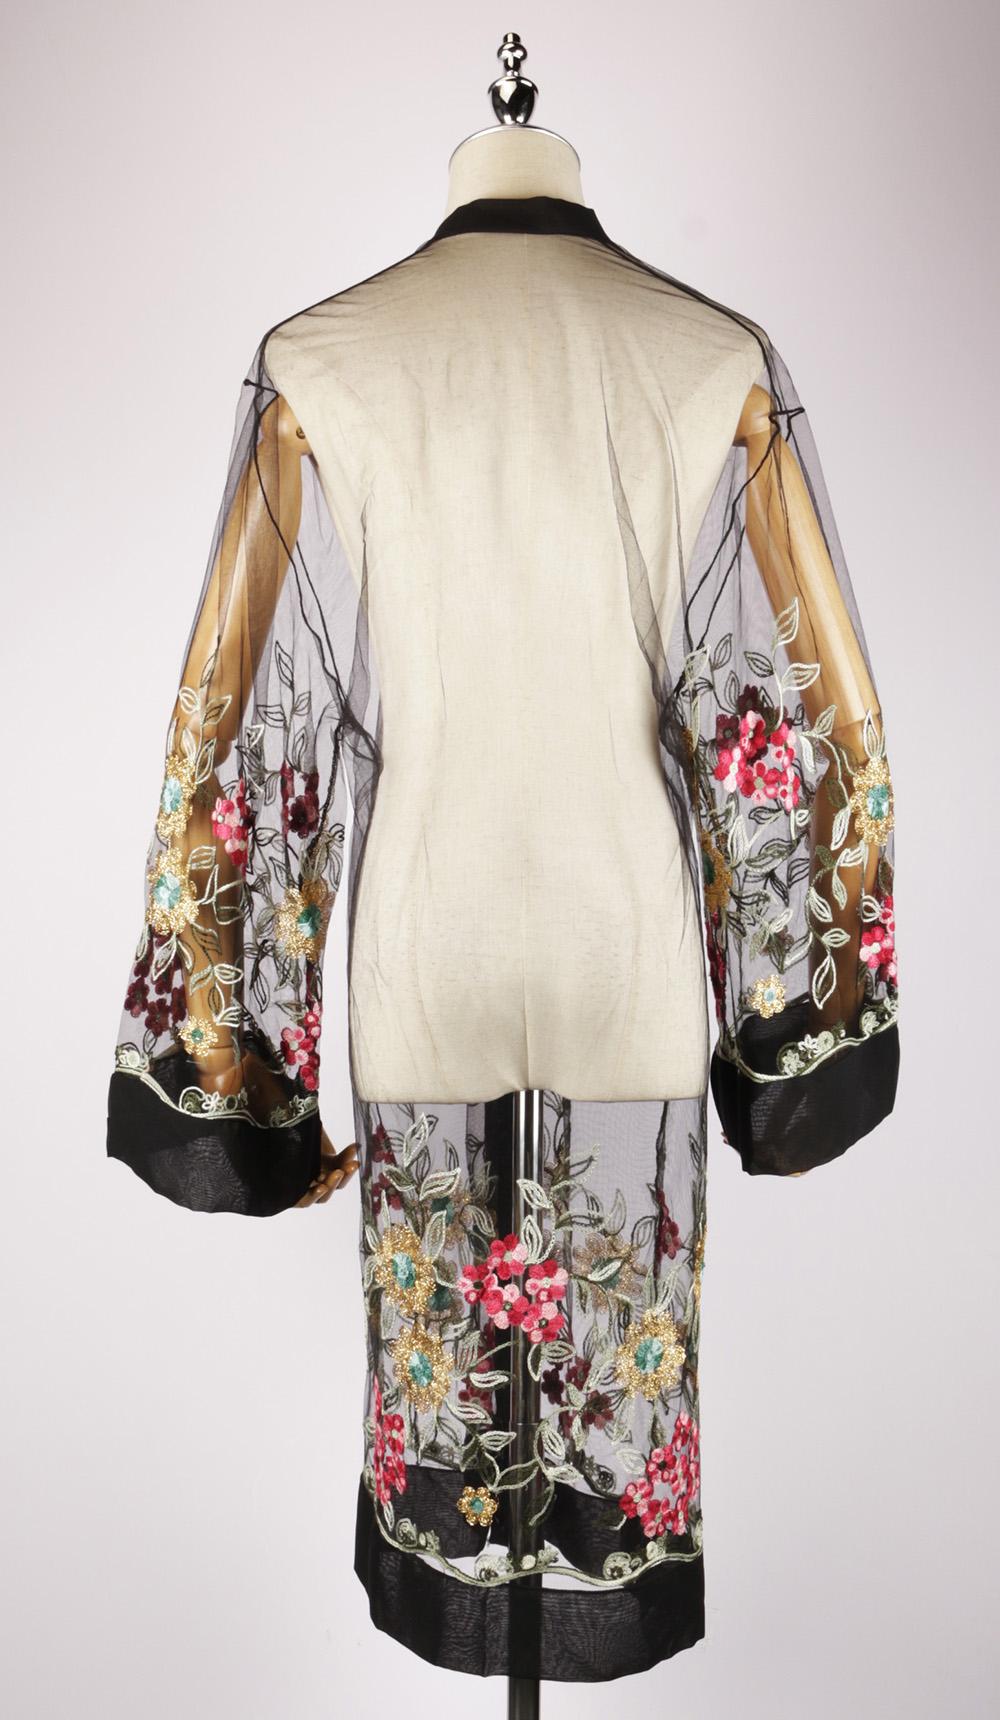 LEK2326 embroidered kimono back